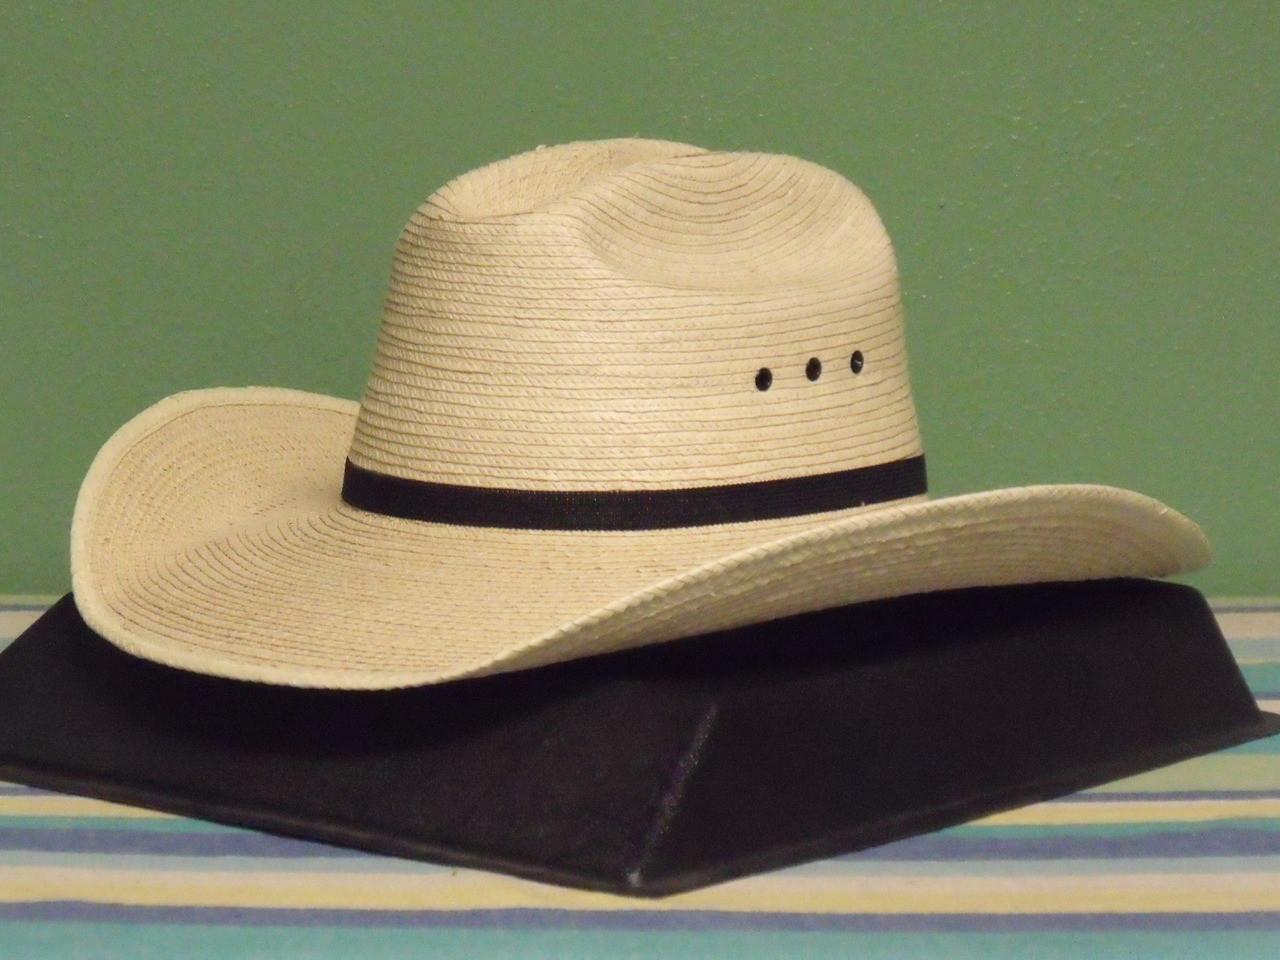 44961e2ff5c2c SunBody Palm Cattleman Cowboy Hat - One 2 mini Ranch